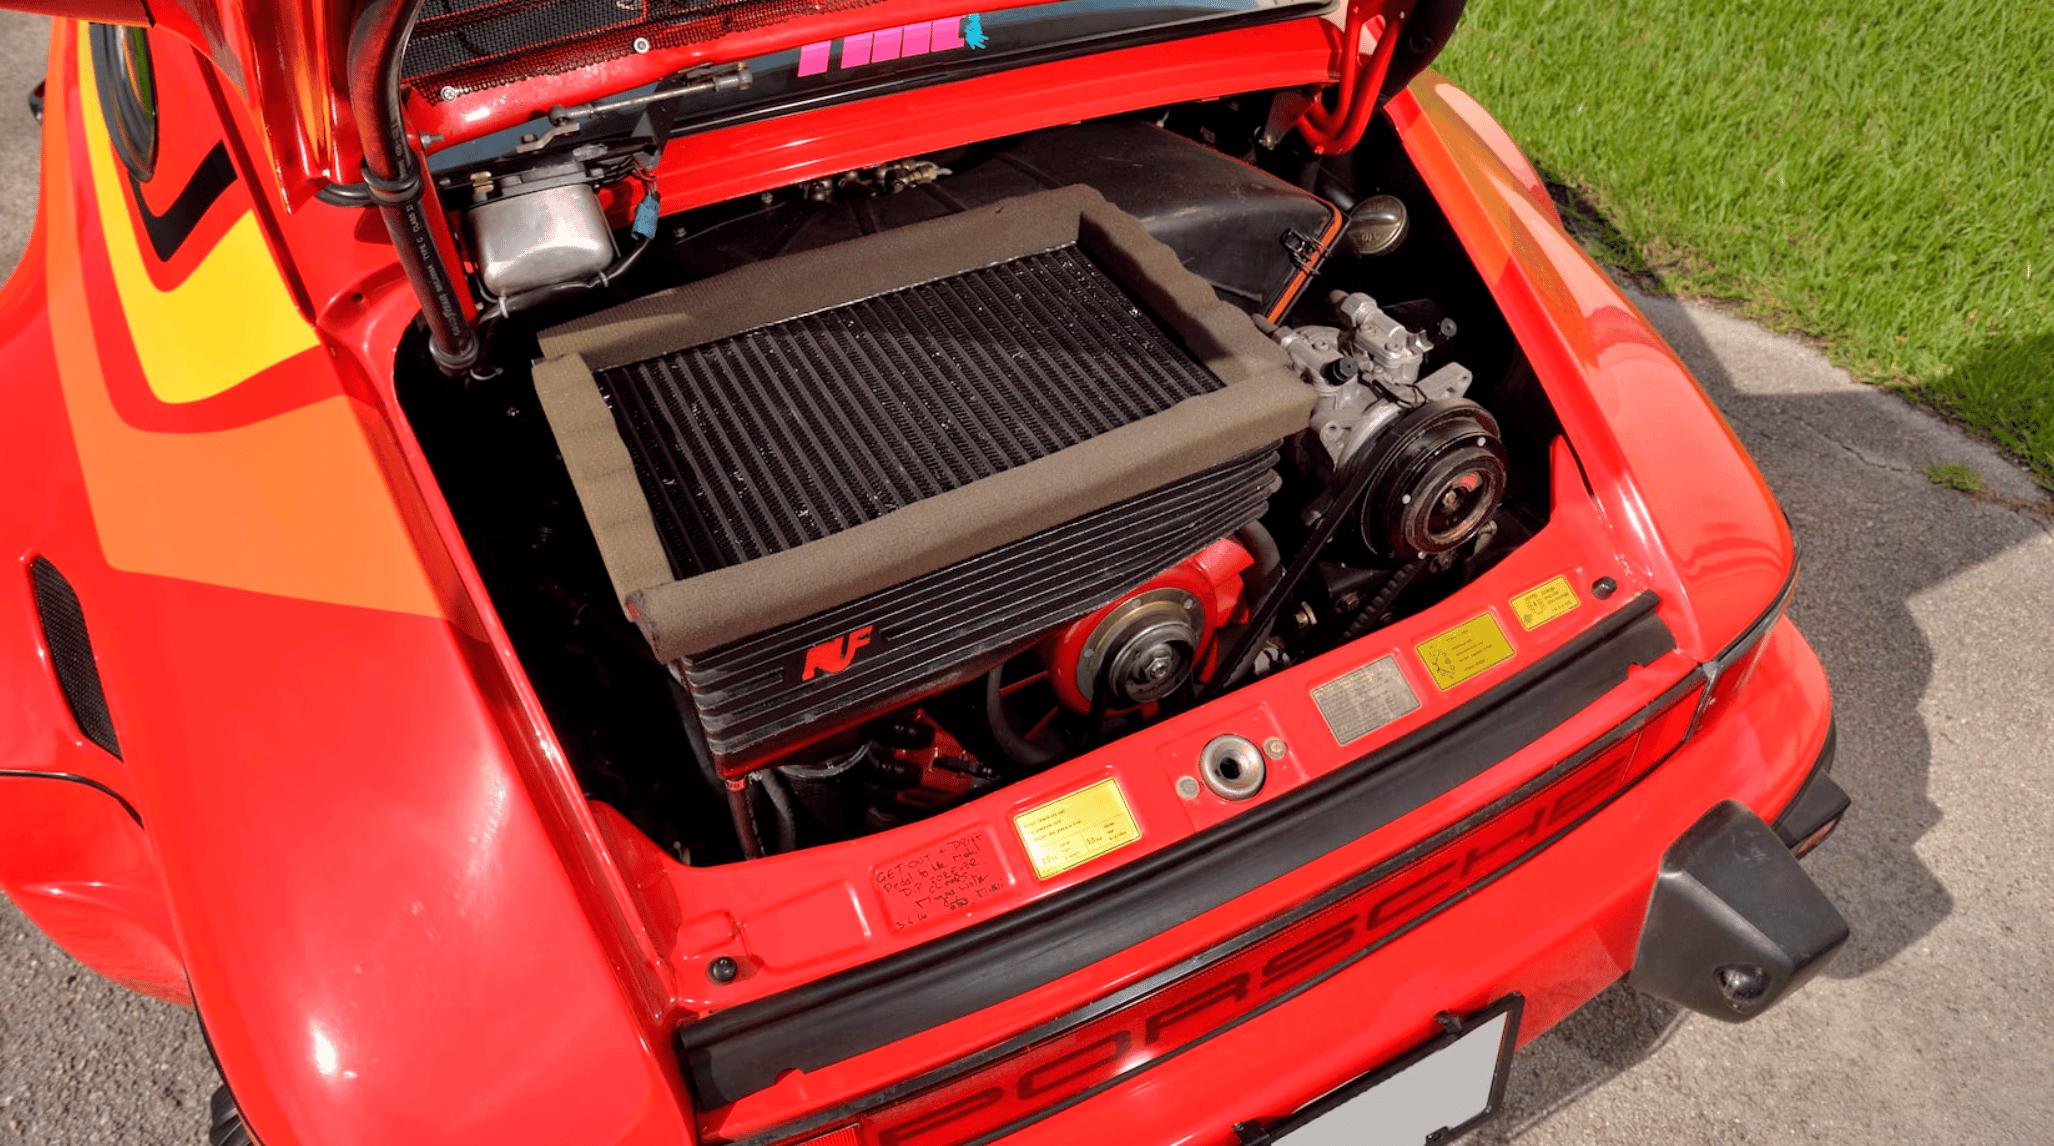 1982 911 Turbo DP 1 935, Ruf BTR engine, speed record car for Car & Driver Magazine